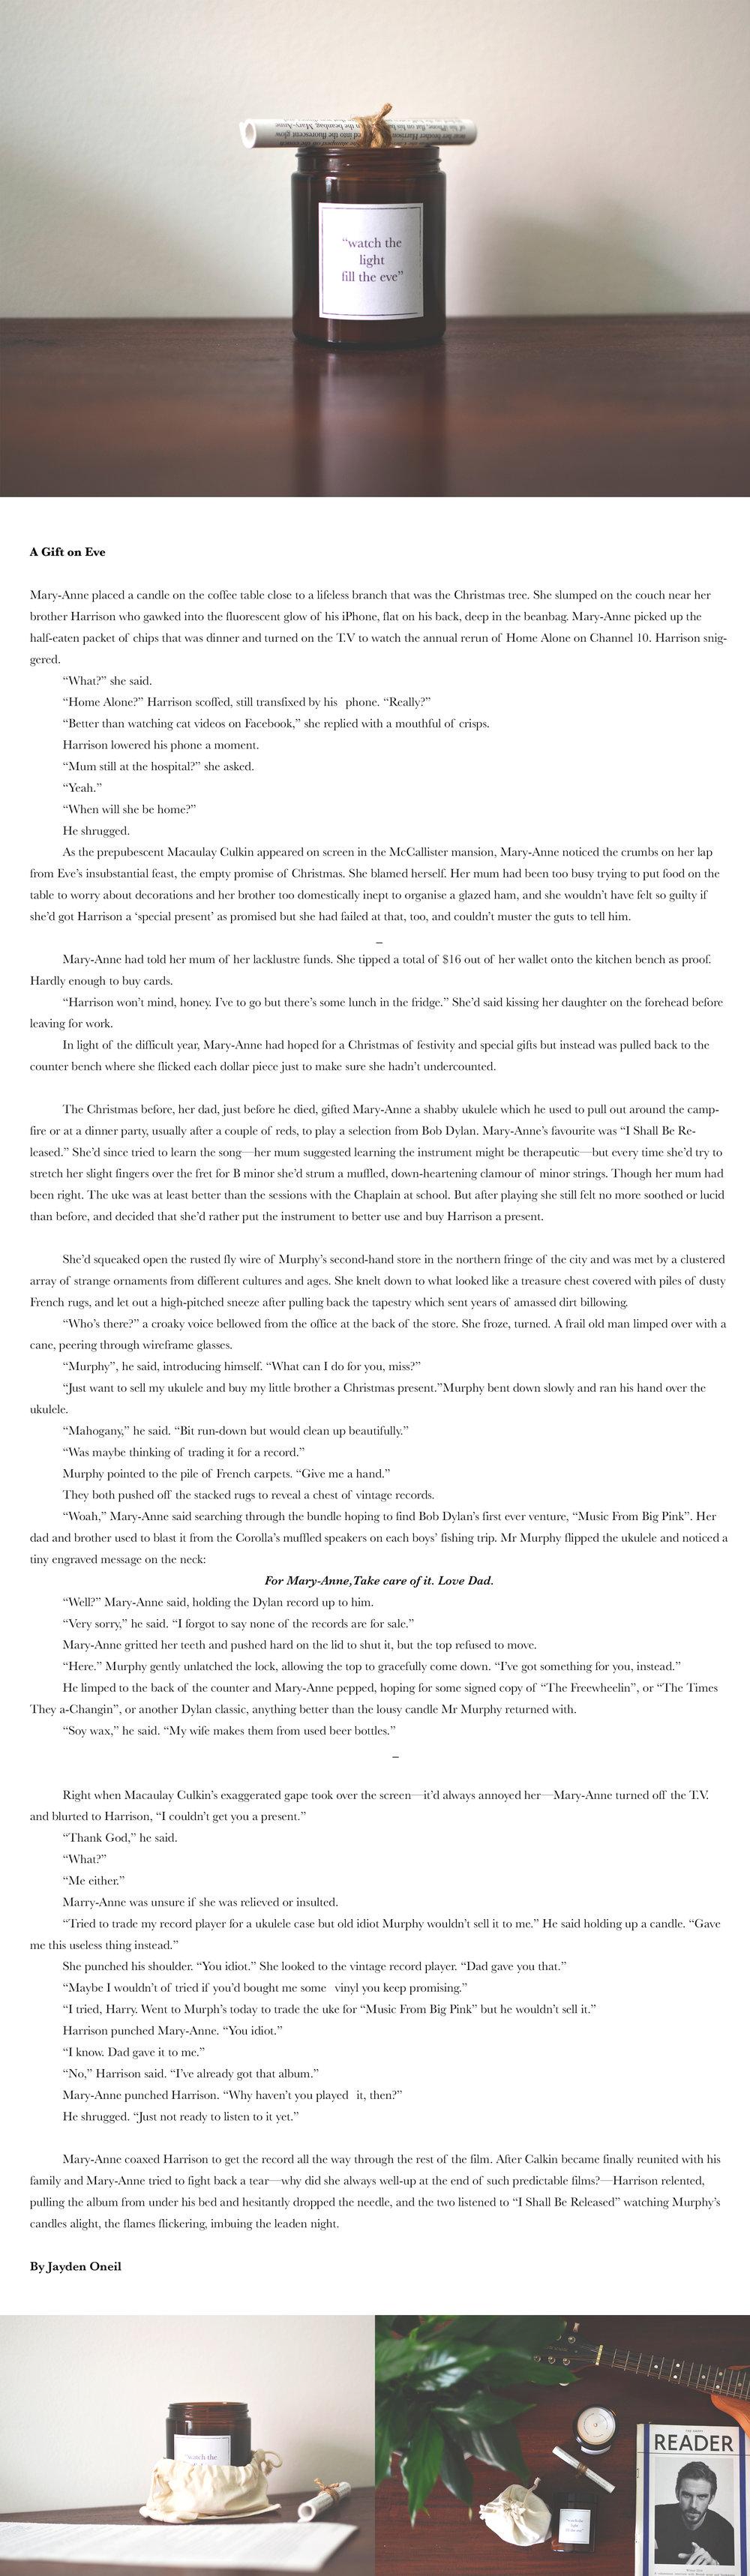 Freelance copy writing Jayden O'Neil